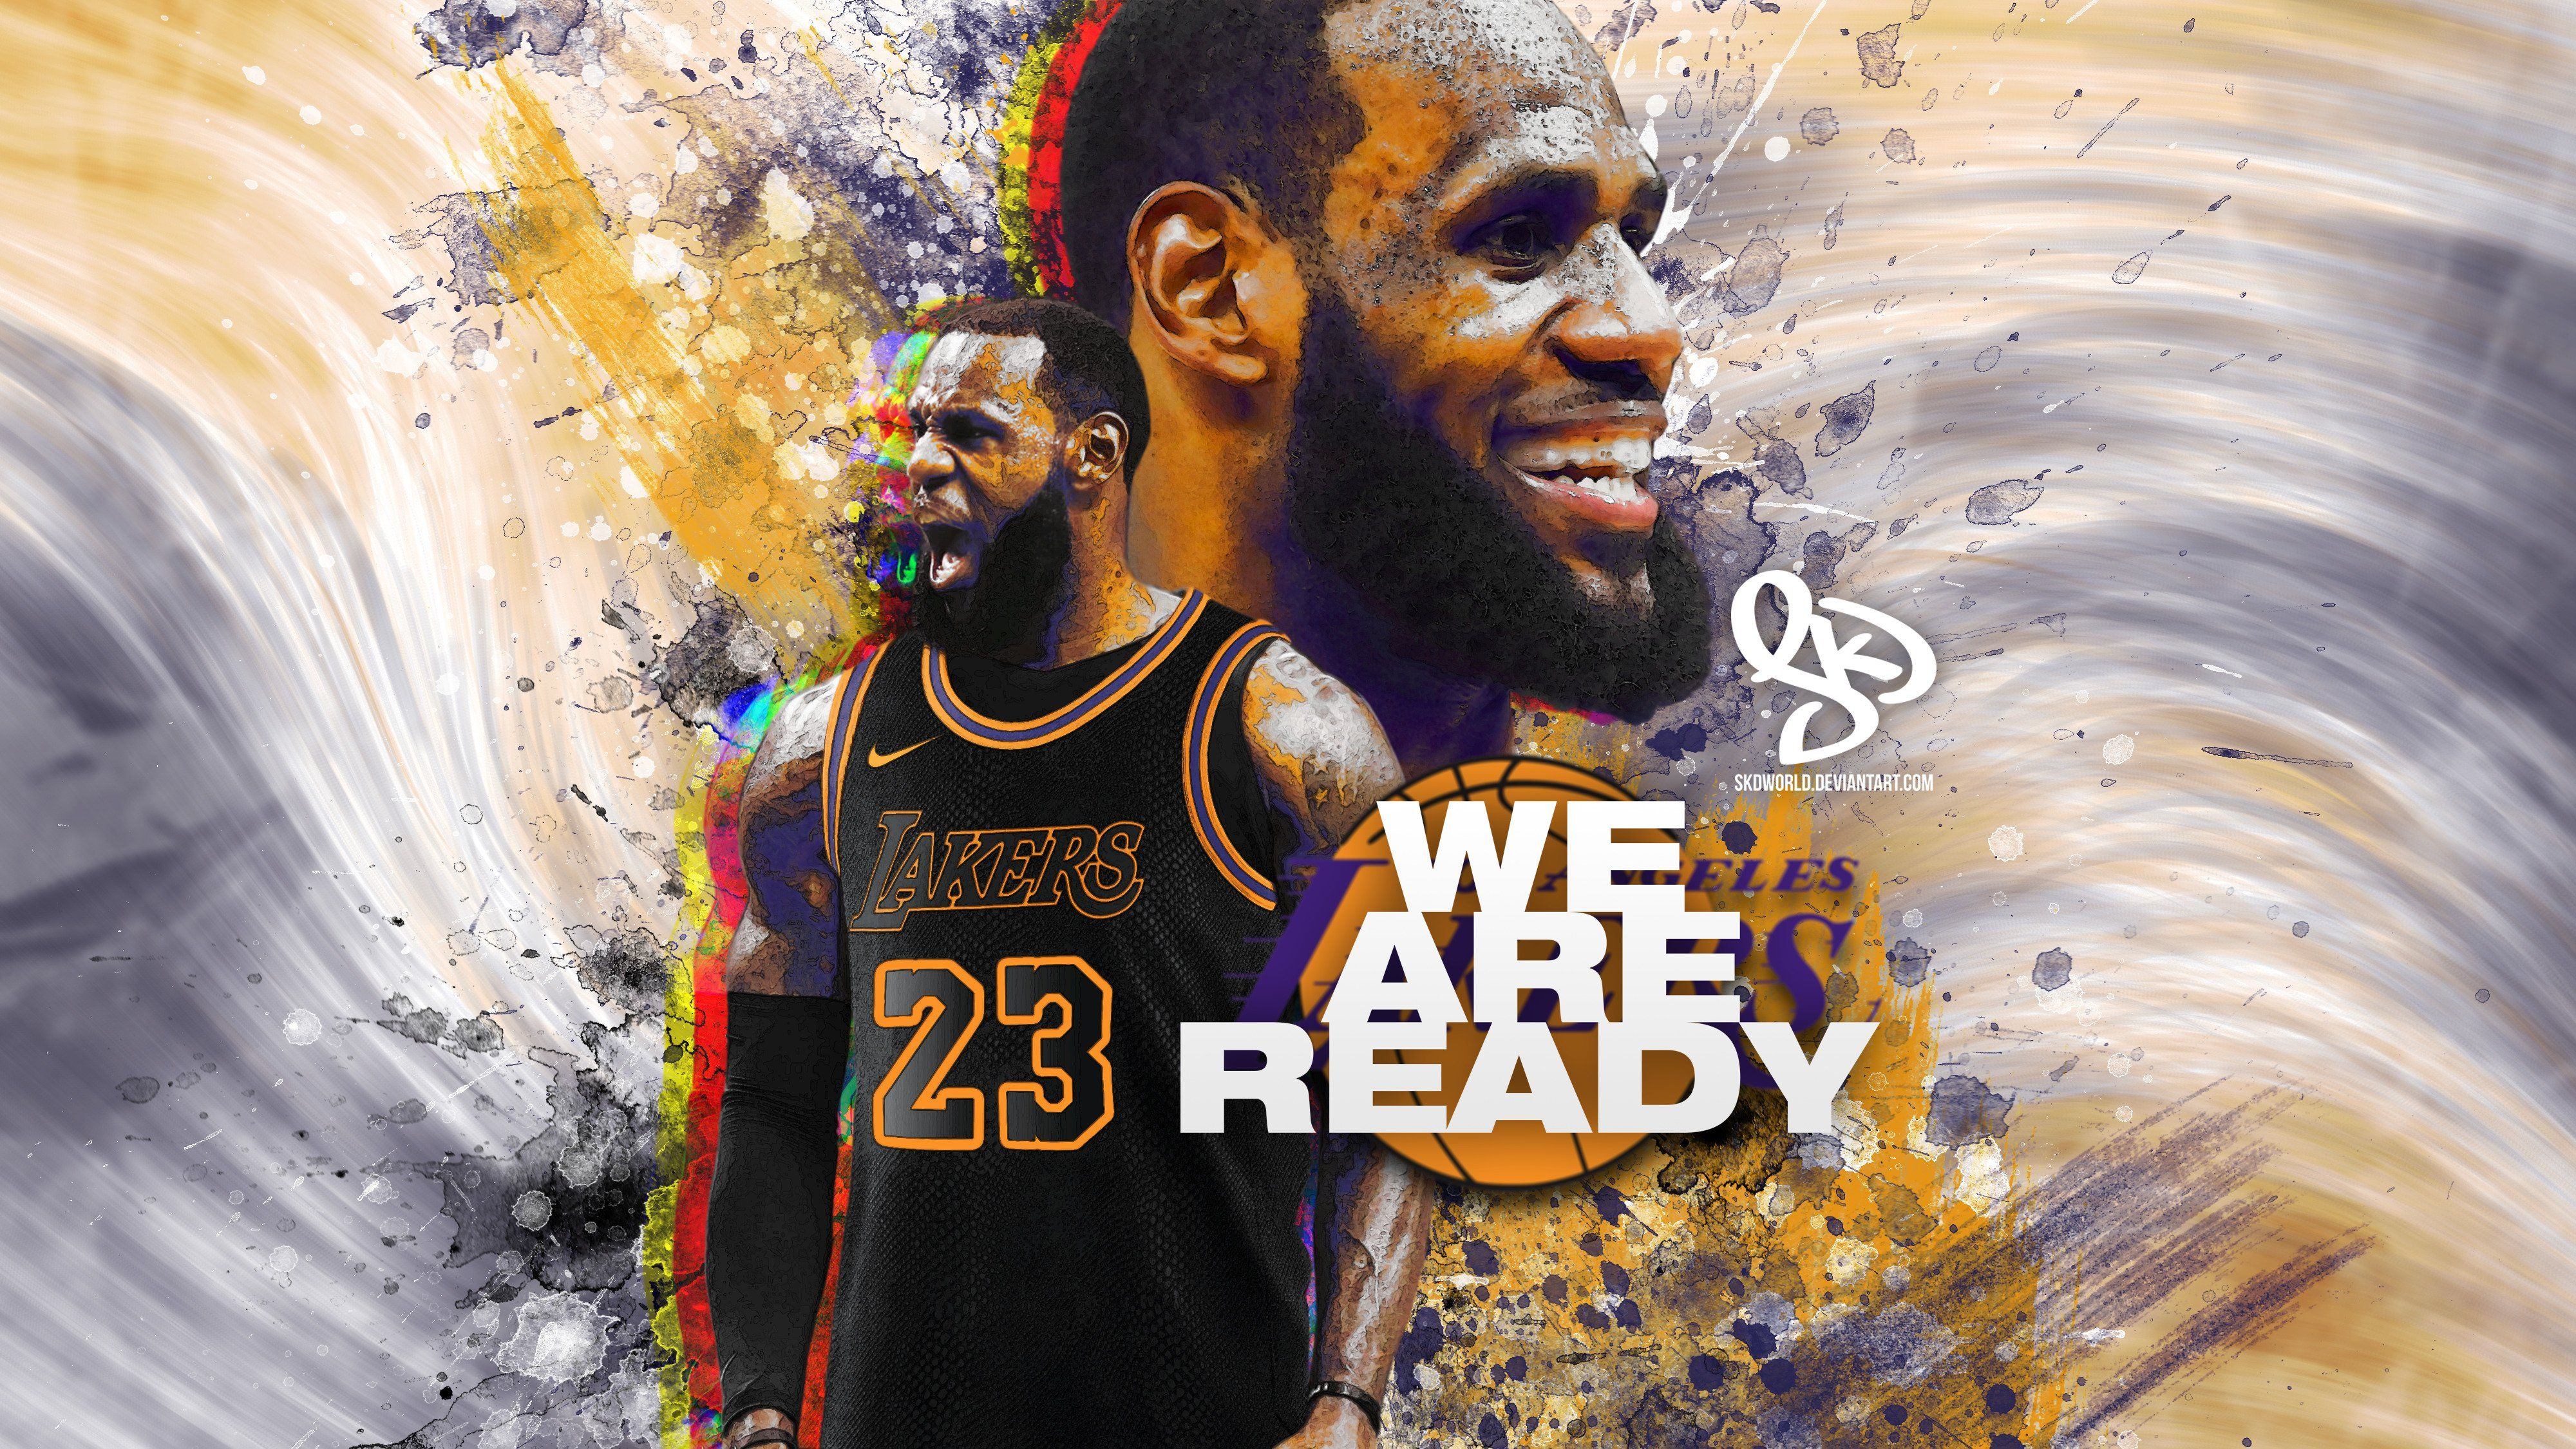 Lebron Lakers Wallpapers - Wallpaper Cave